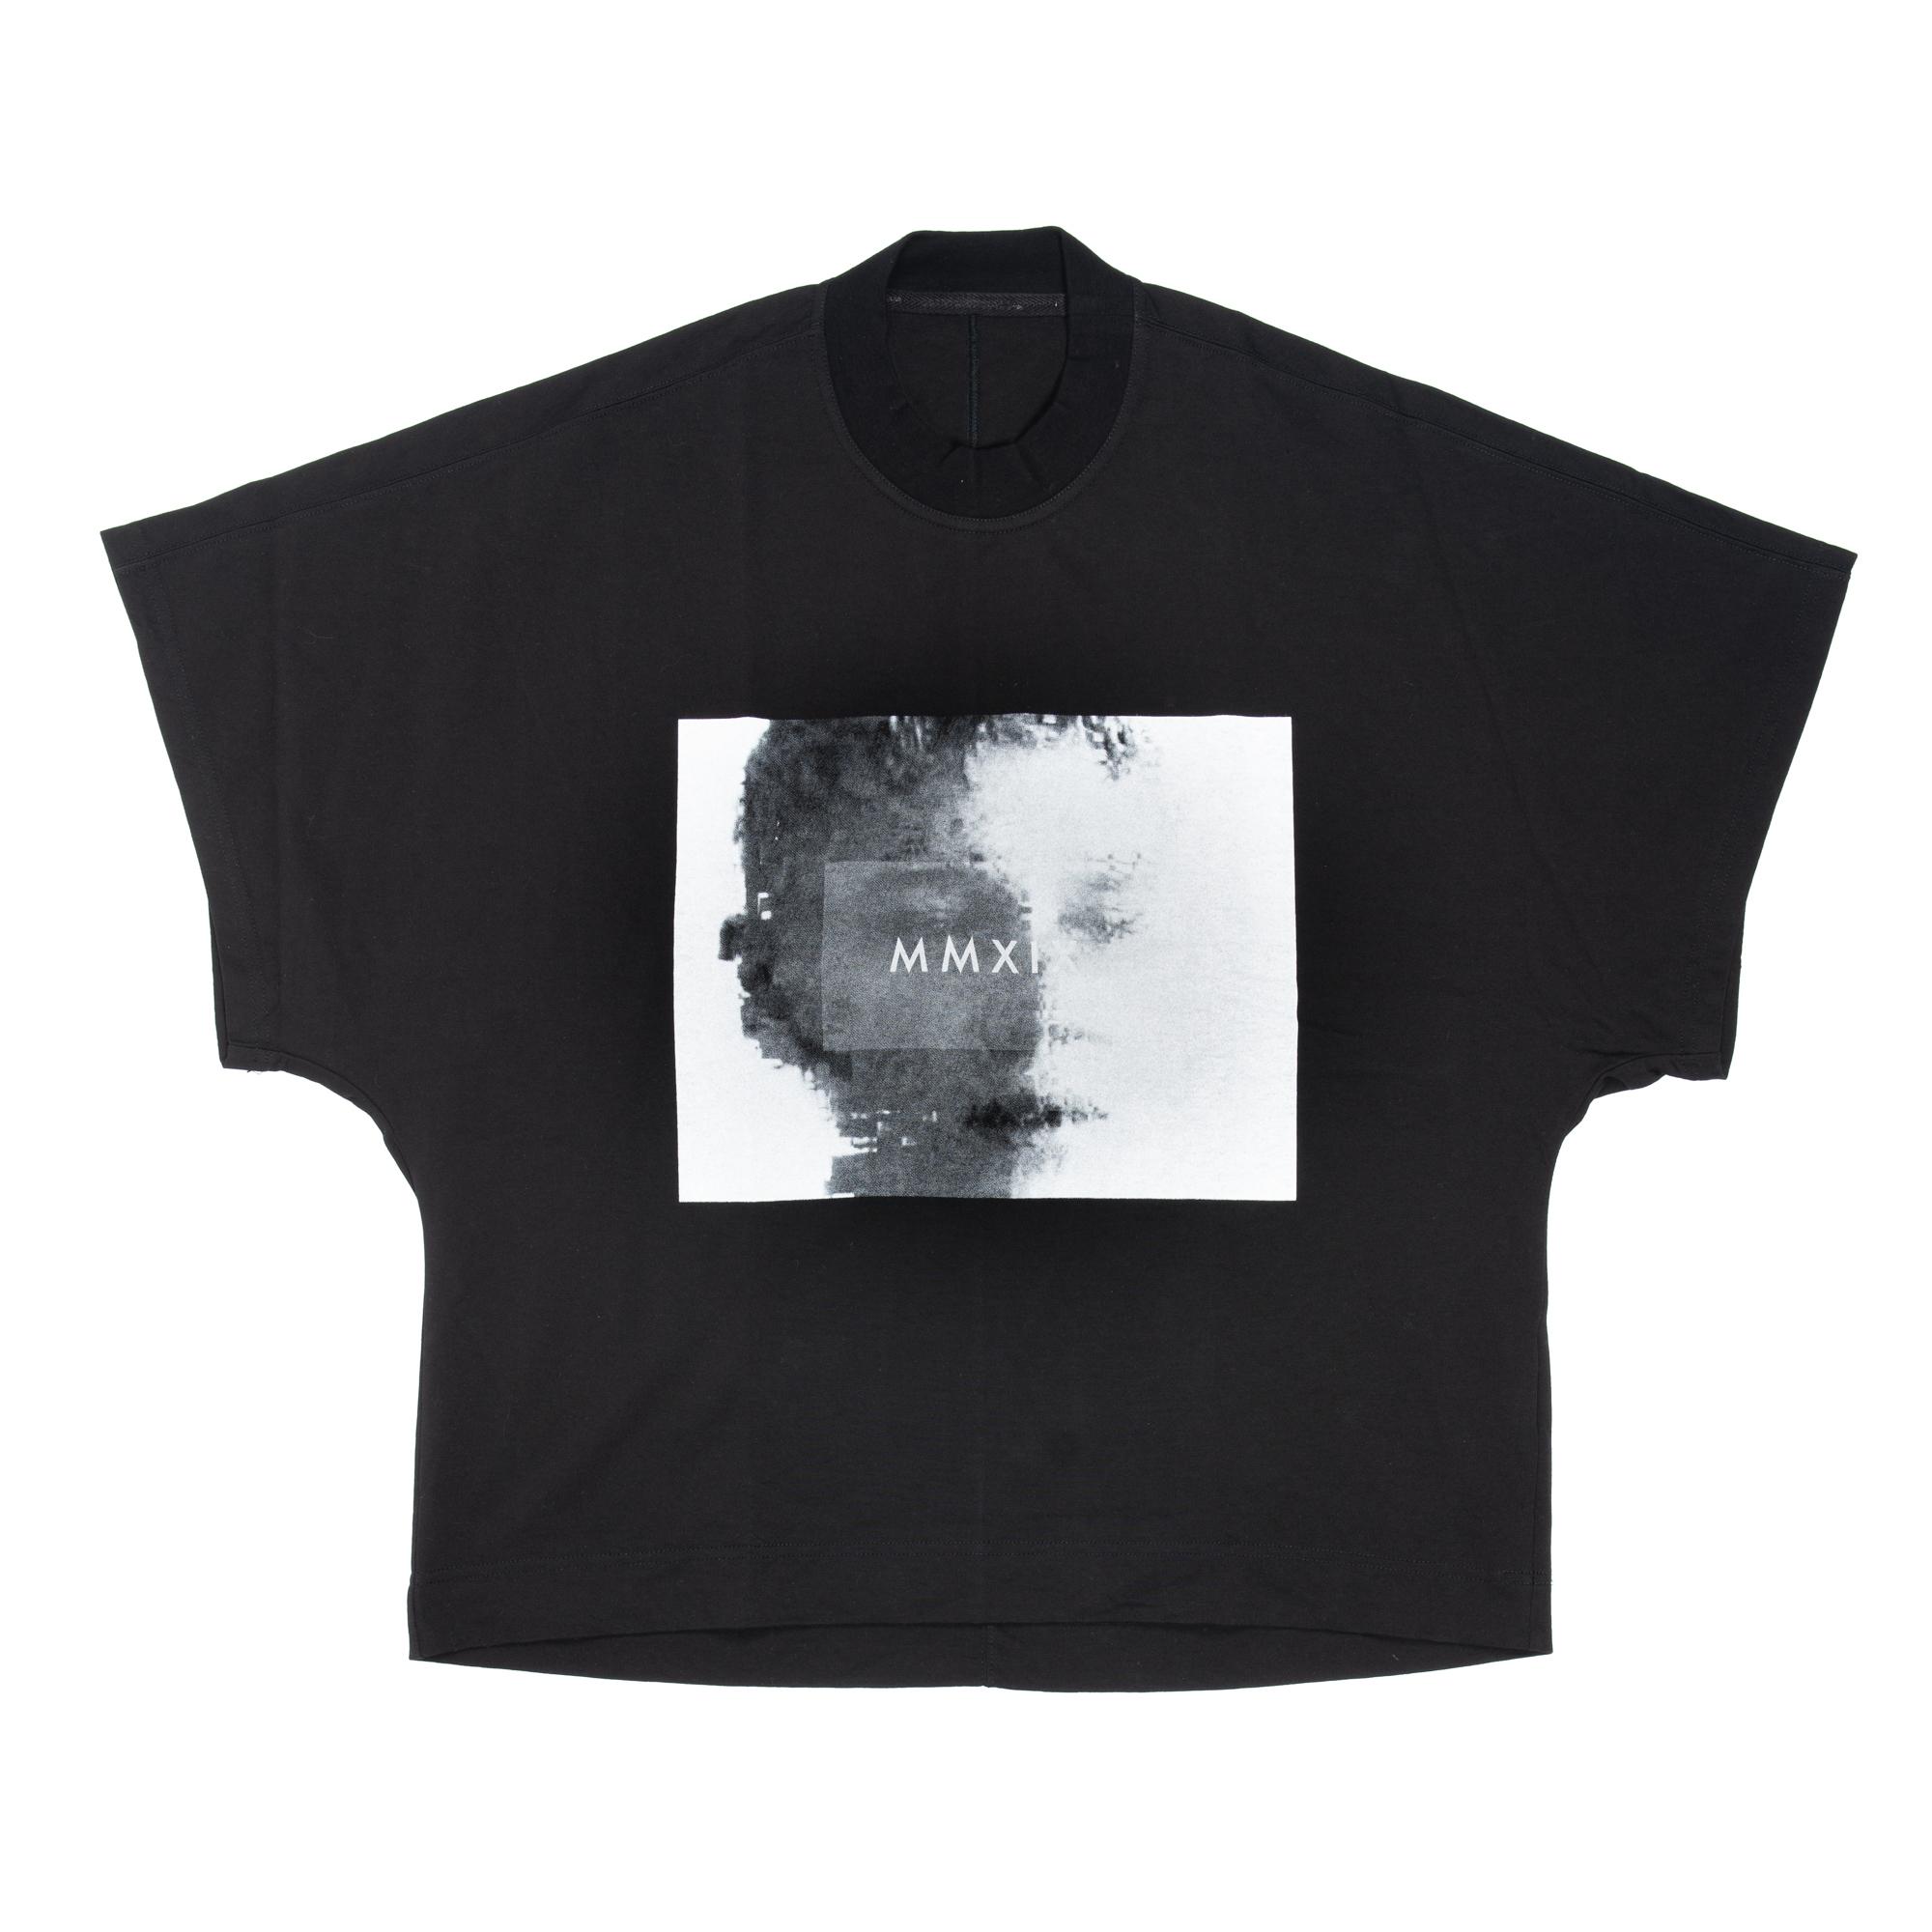 657CPM11-BLACK / プリントカイトTシャツ